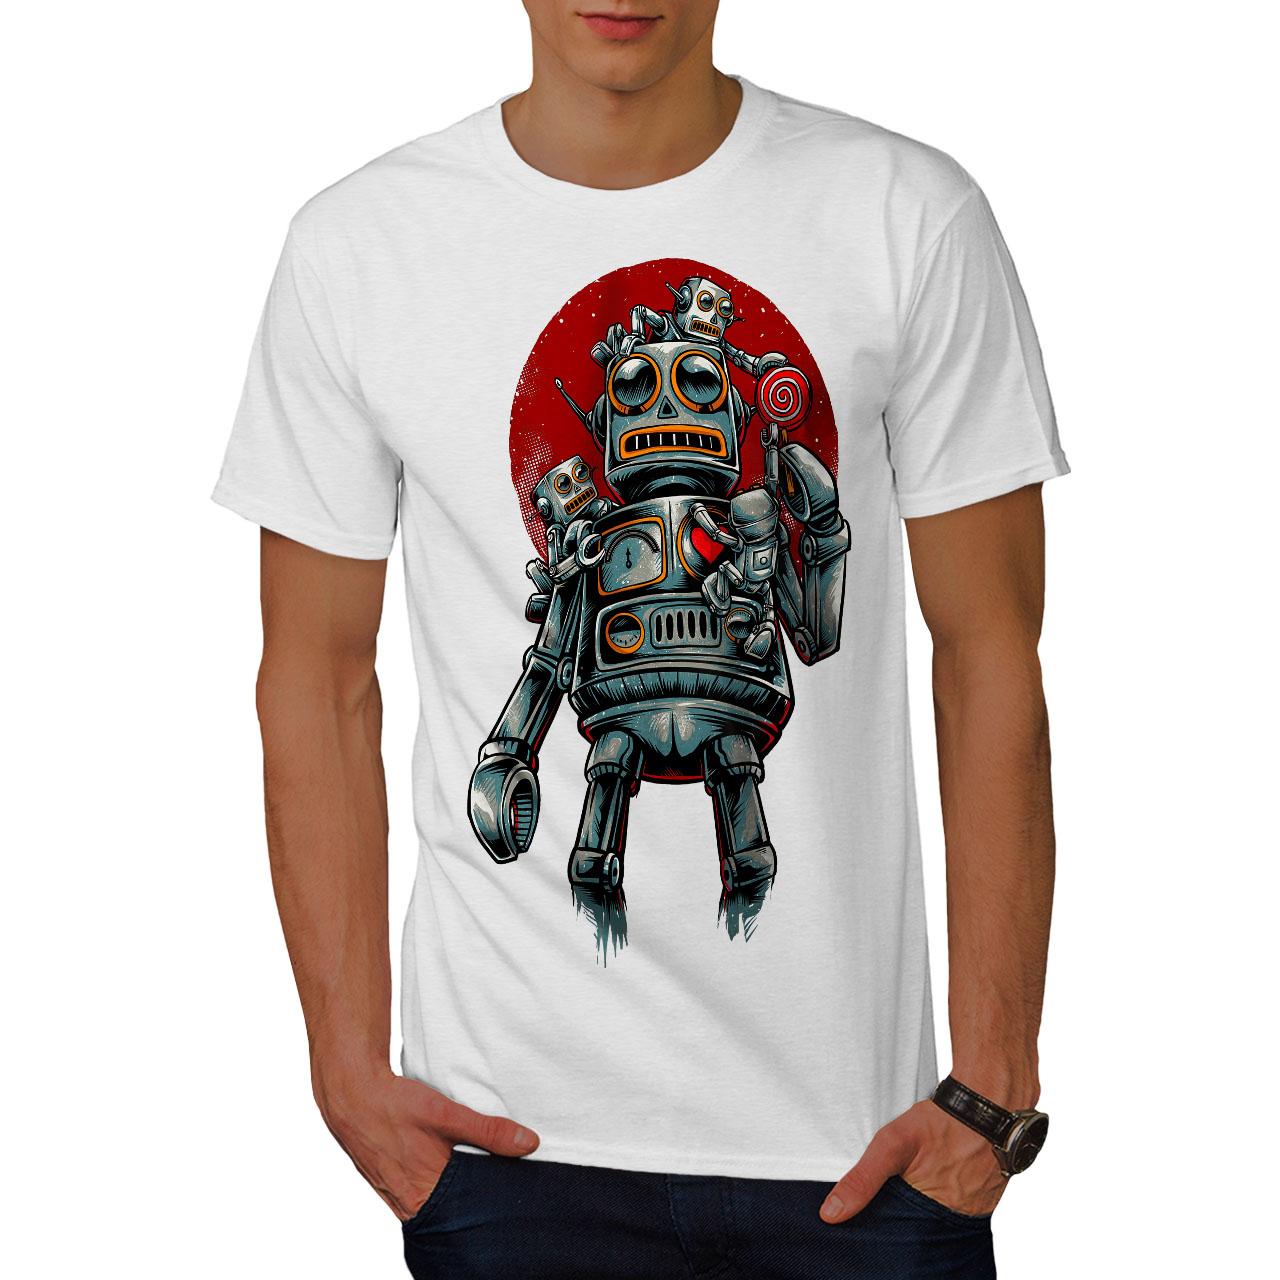 miniature 9 - Wellcoda Crazy Robot Mens T-shirt, Mechanical Graphic Design Printed Tee